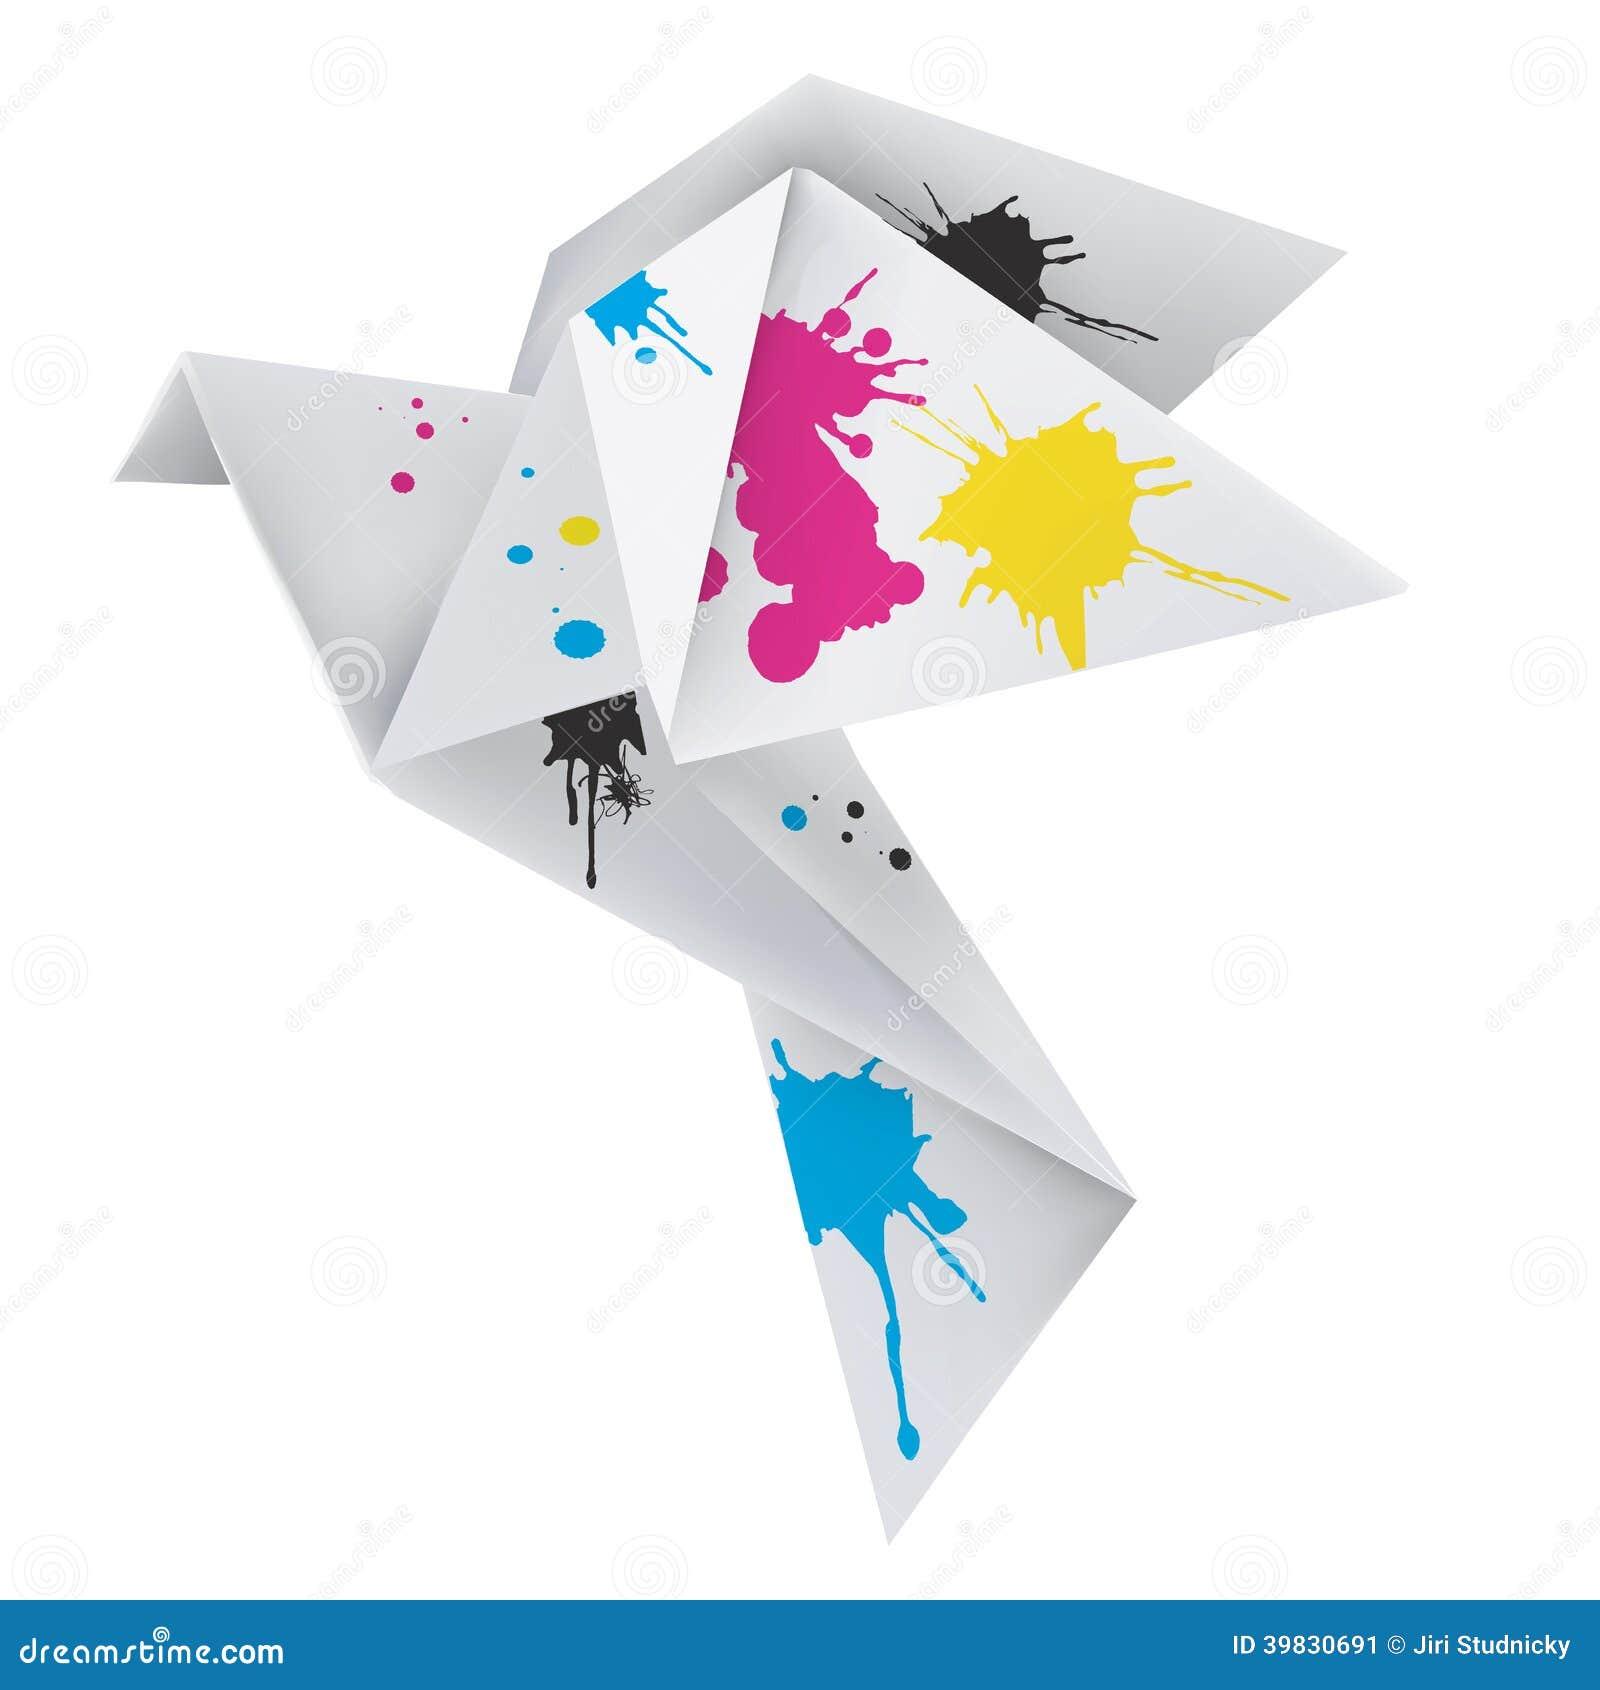 Origami Dove With Splashes Of Ink Stock Photo - Image ... - photo#24